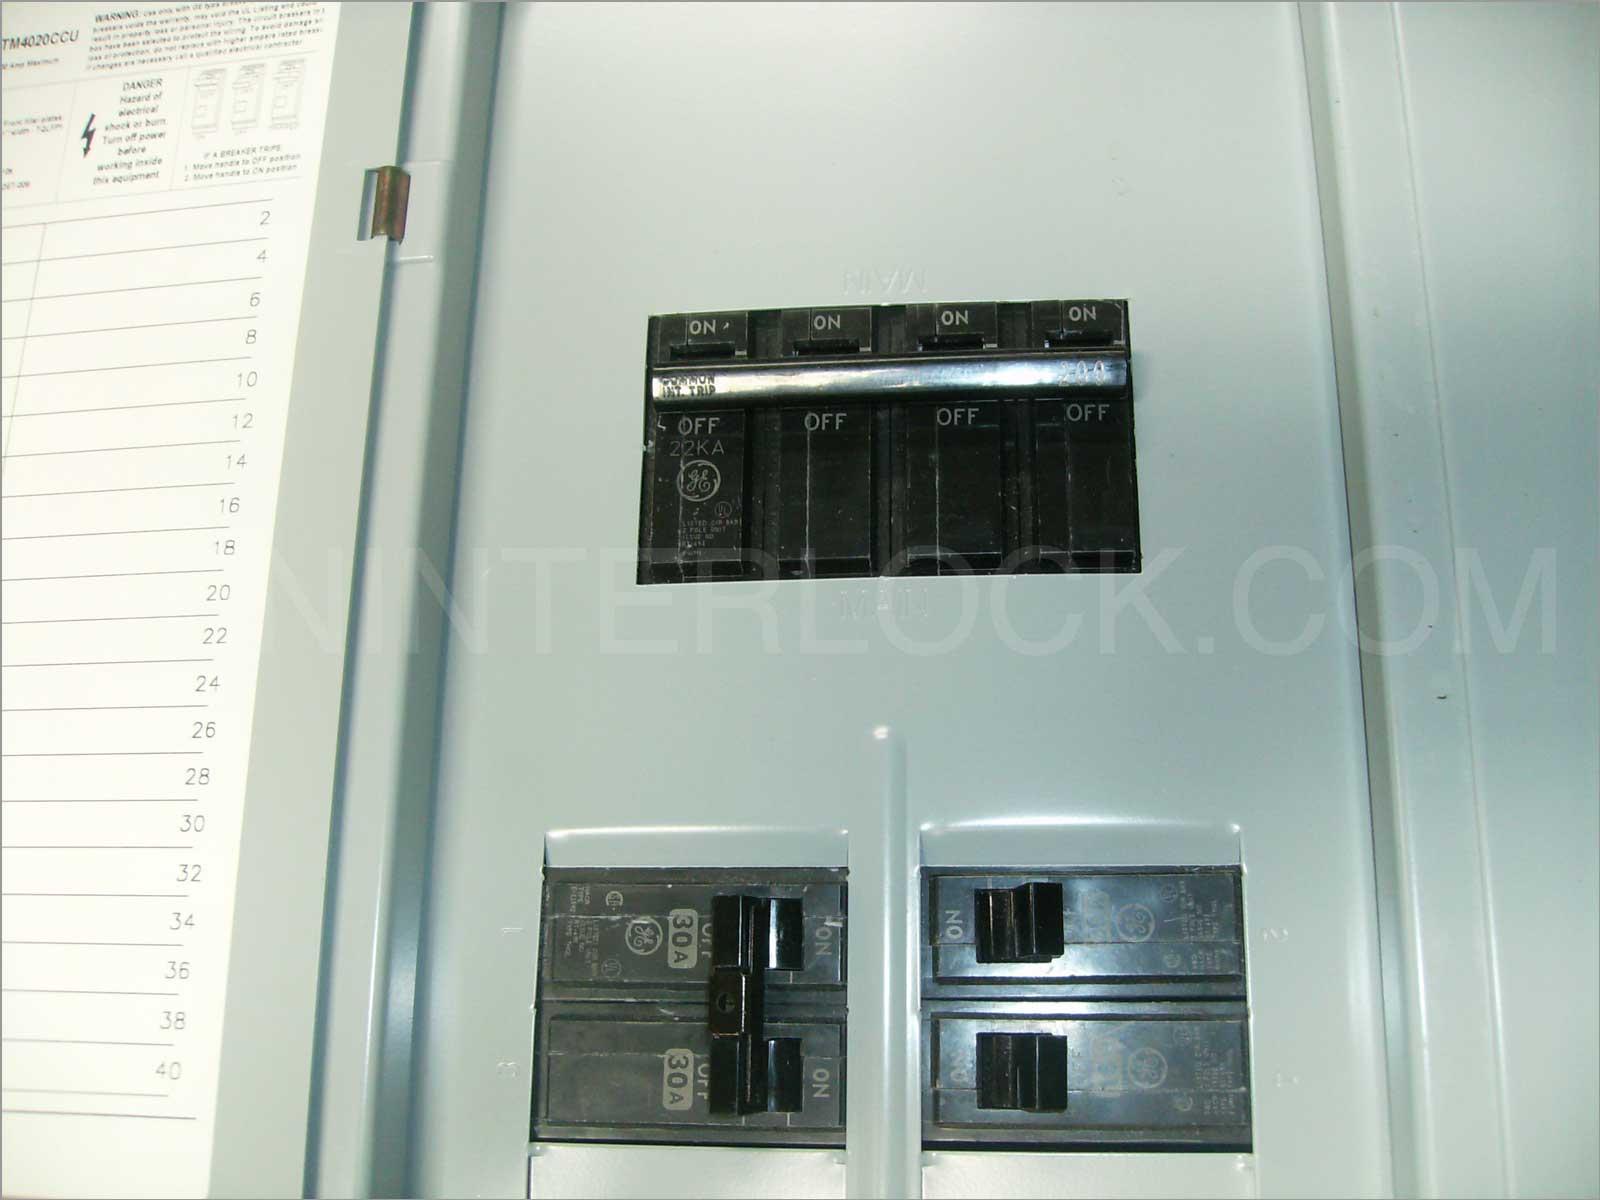 Eatch U I Lg likewise Facmur Hr U Lg likewise Sdh I Lg X likewise Fac Ge Hd U Lg together with Ge U Lg X. on siemens 200 amp main breaker panel